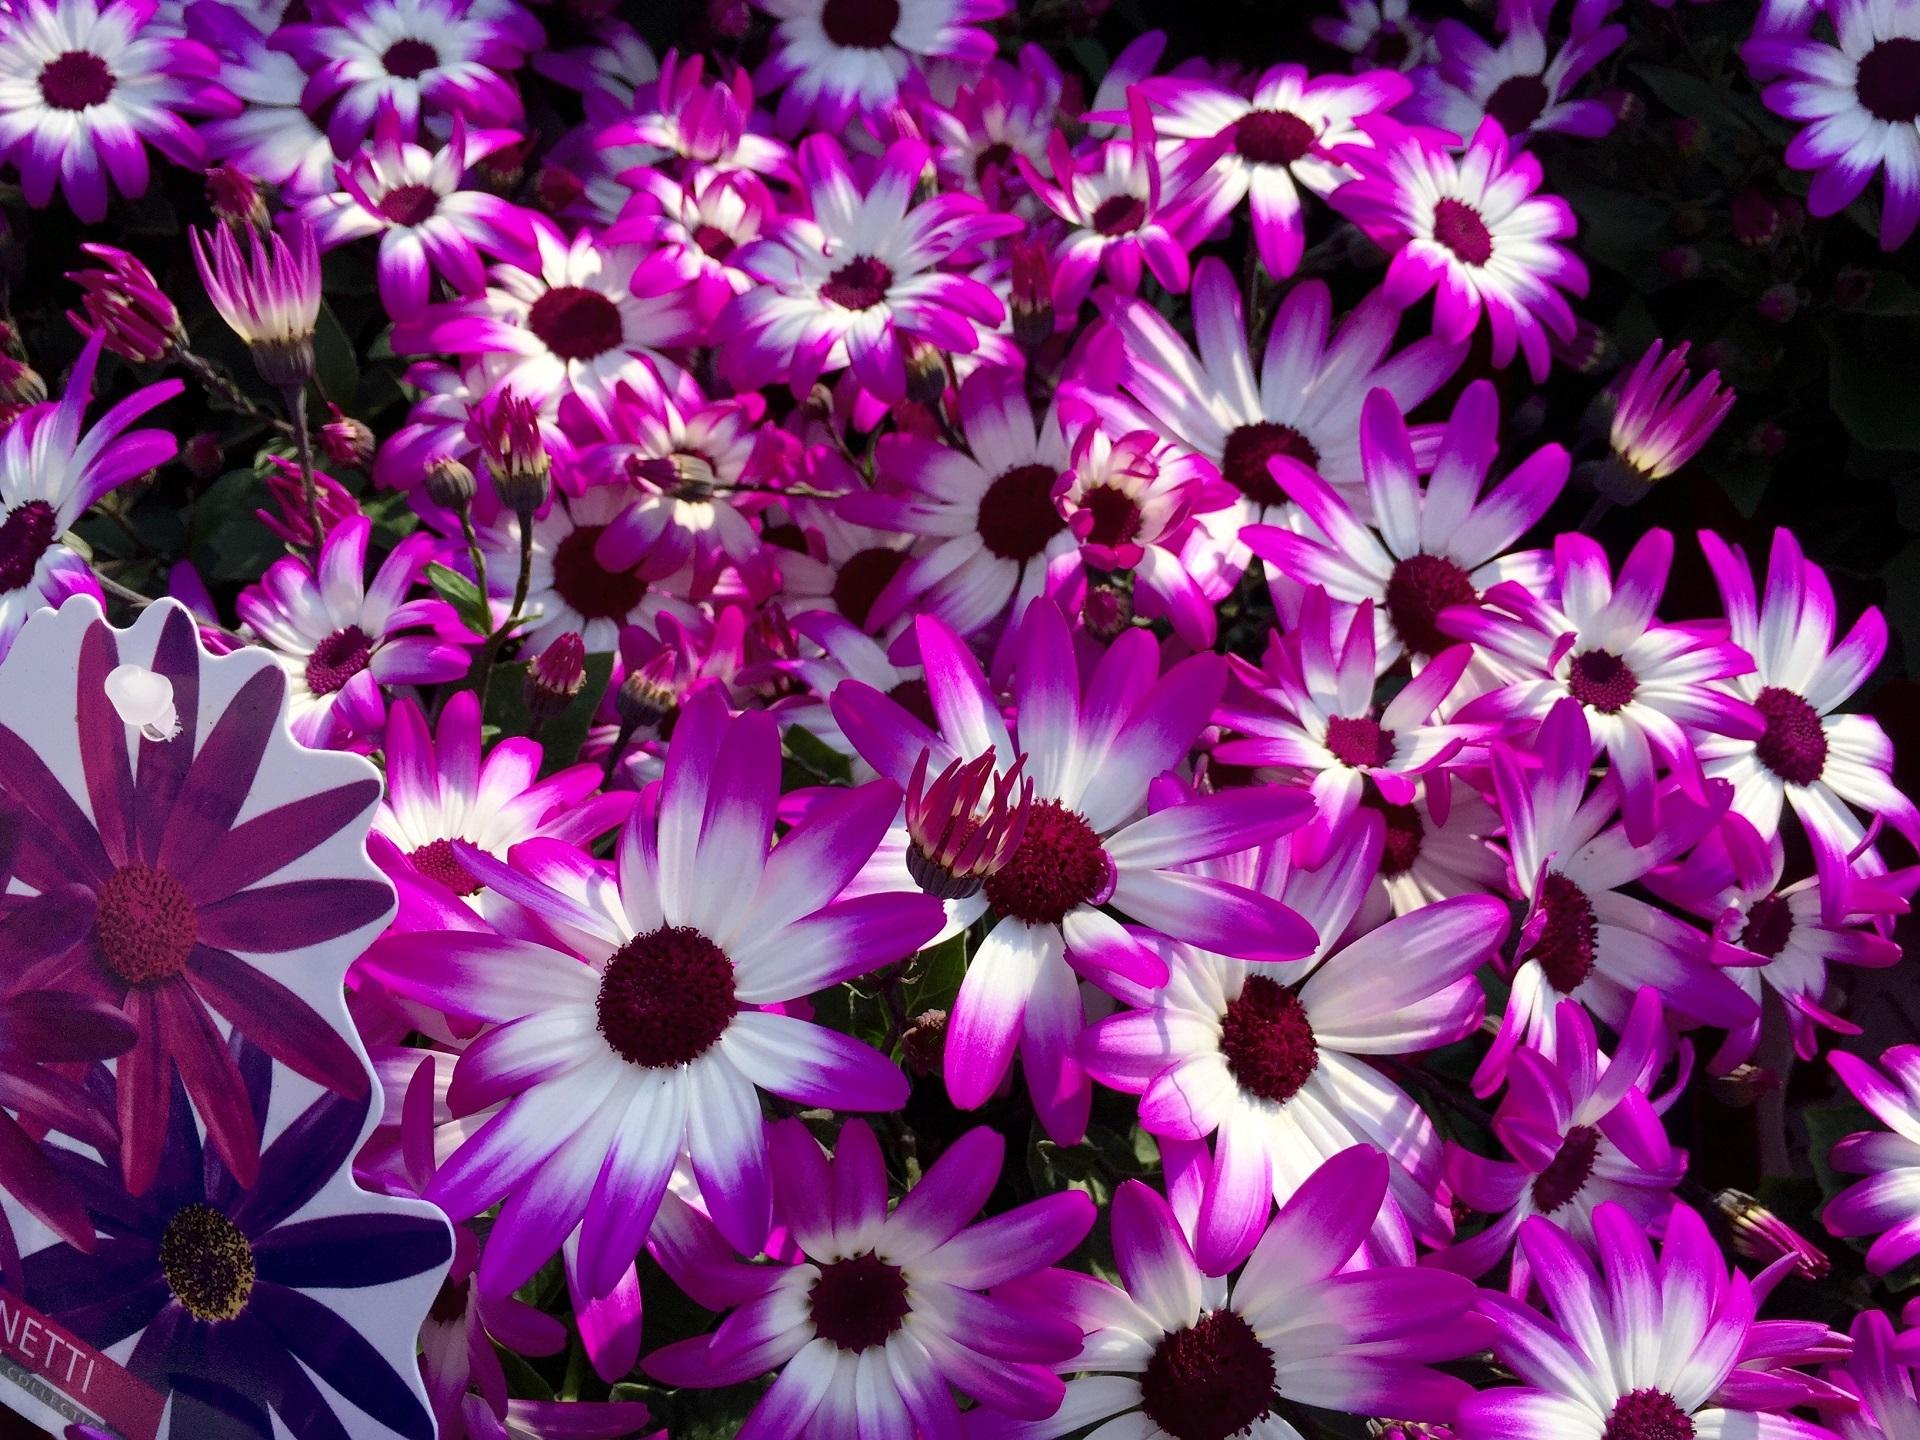 Free Images Blossom White Flower Purple Petal Fl Color Botany Colorful Blanket Flora Wildflower Flowers Petals Bright Blossoms